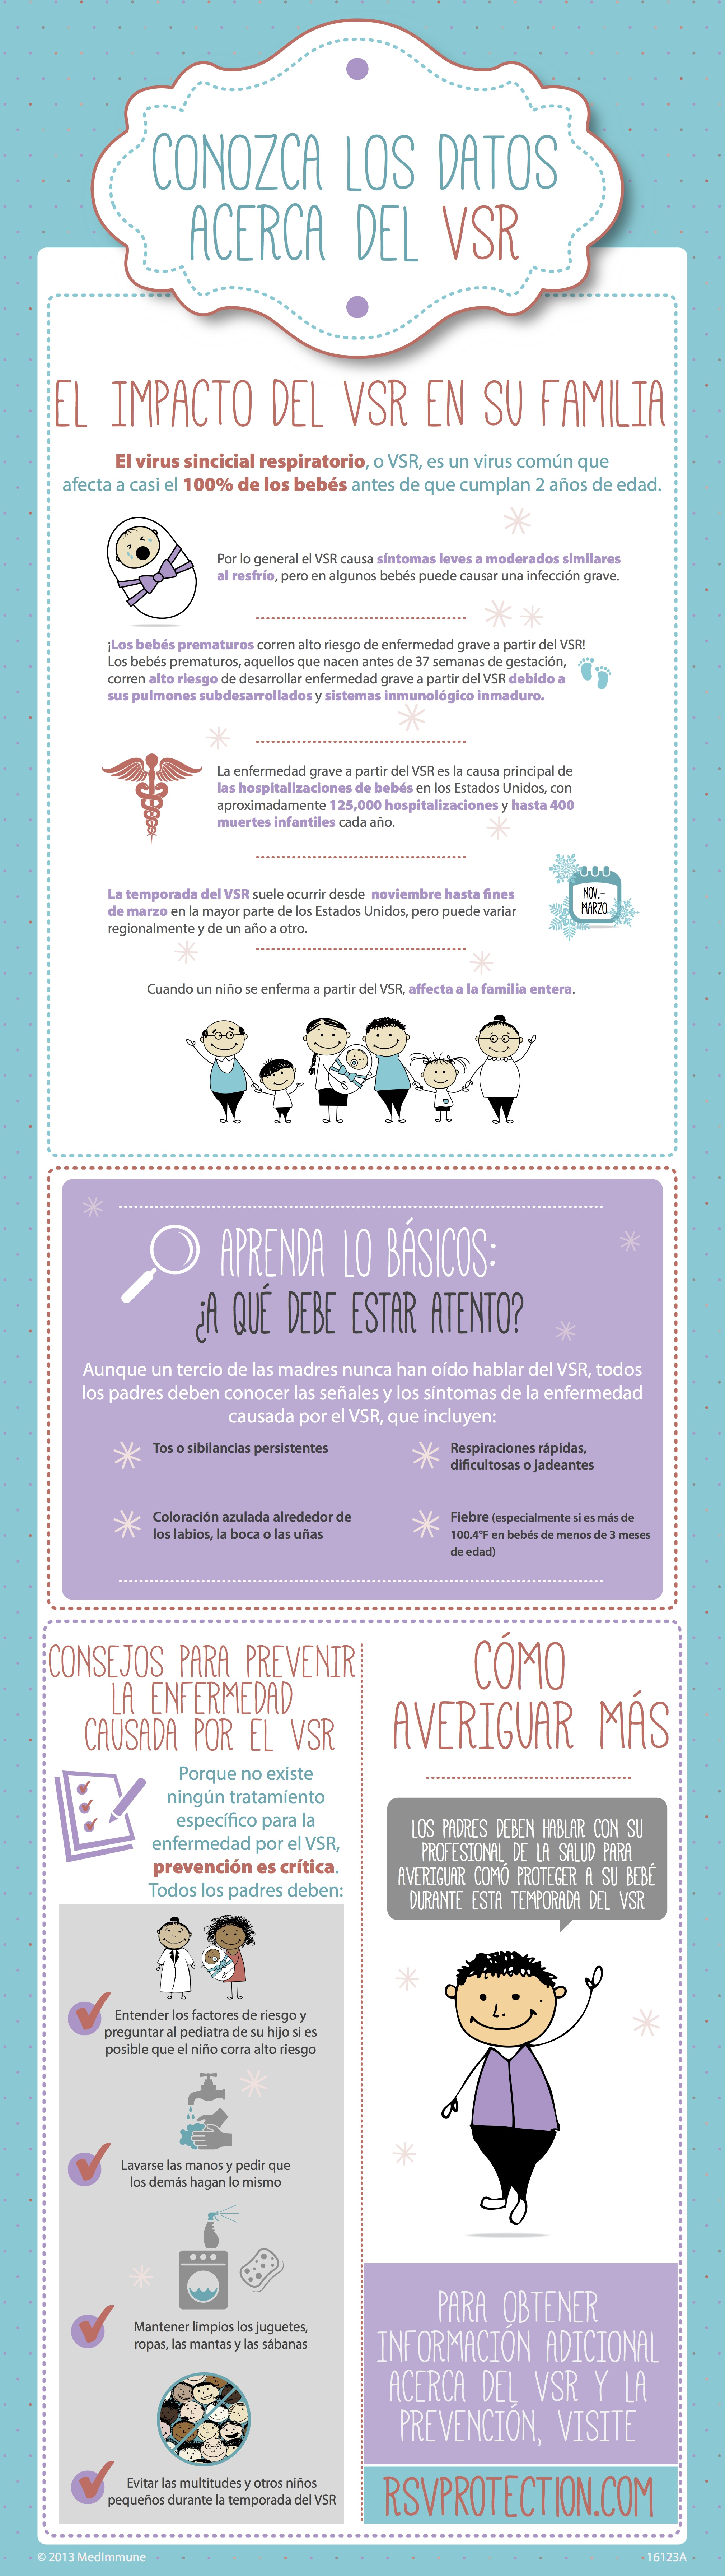 RSV Infographic - SPANISH